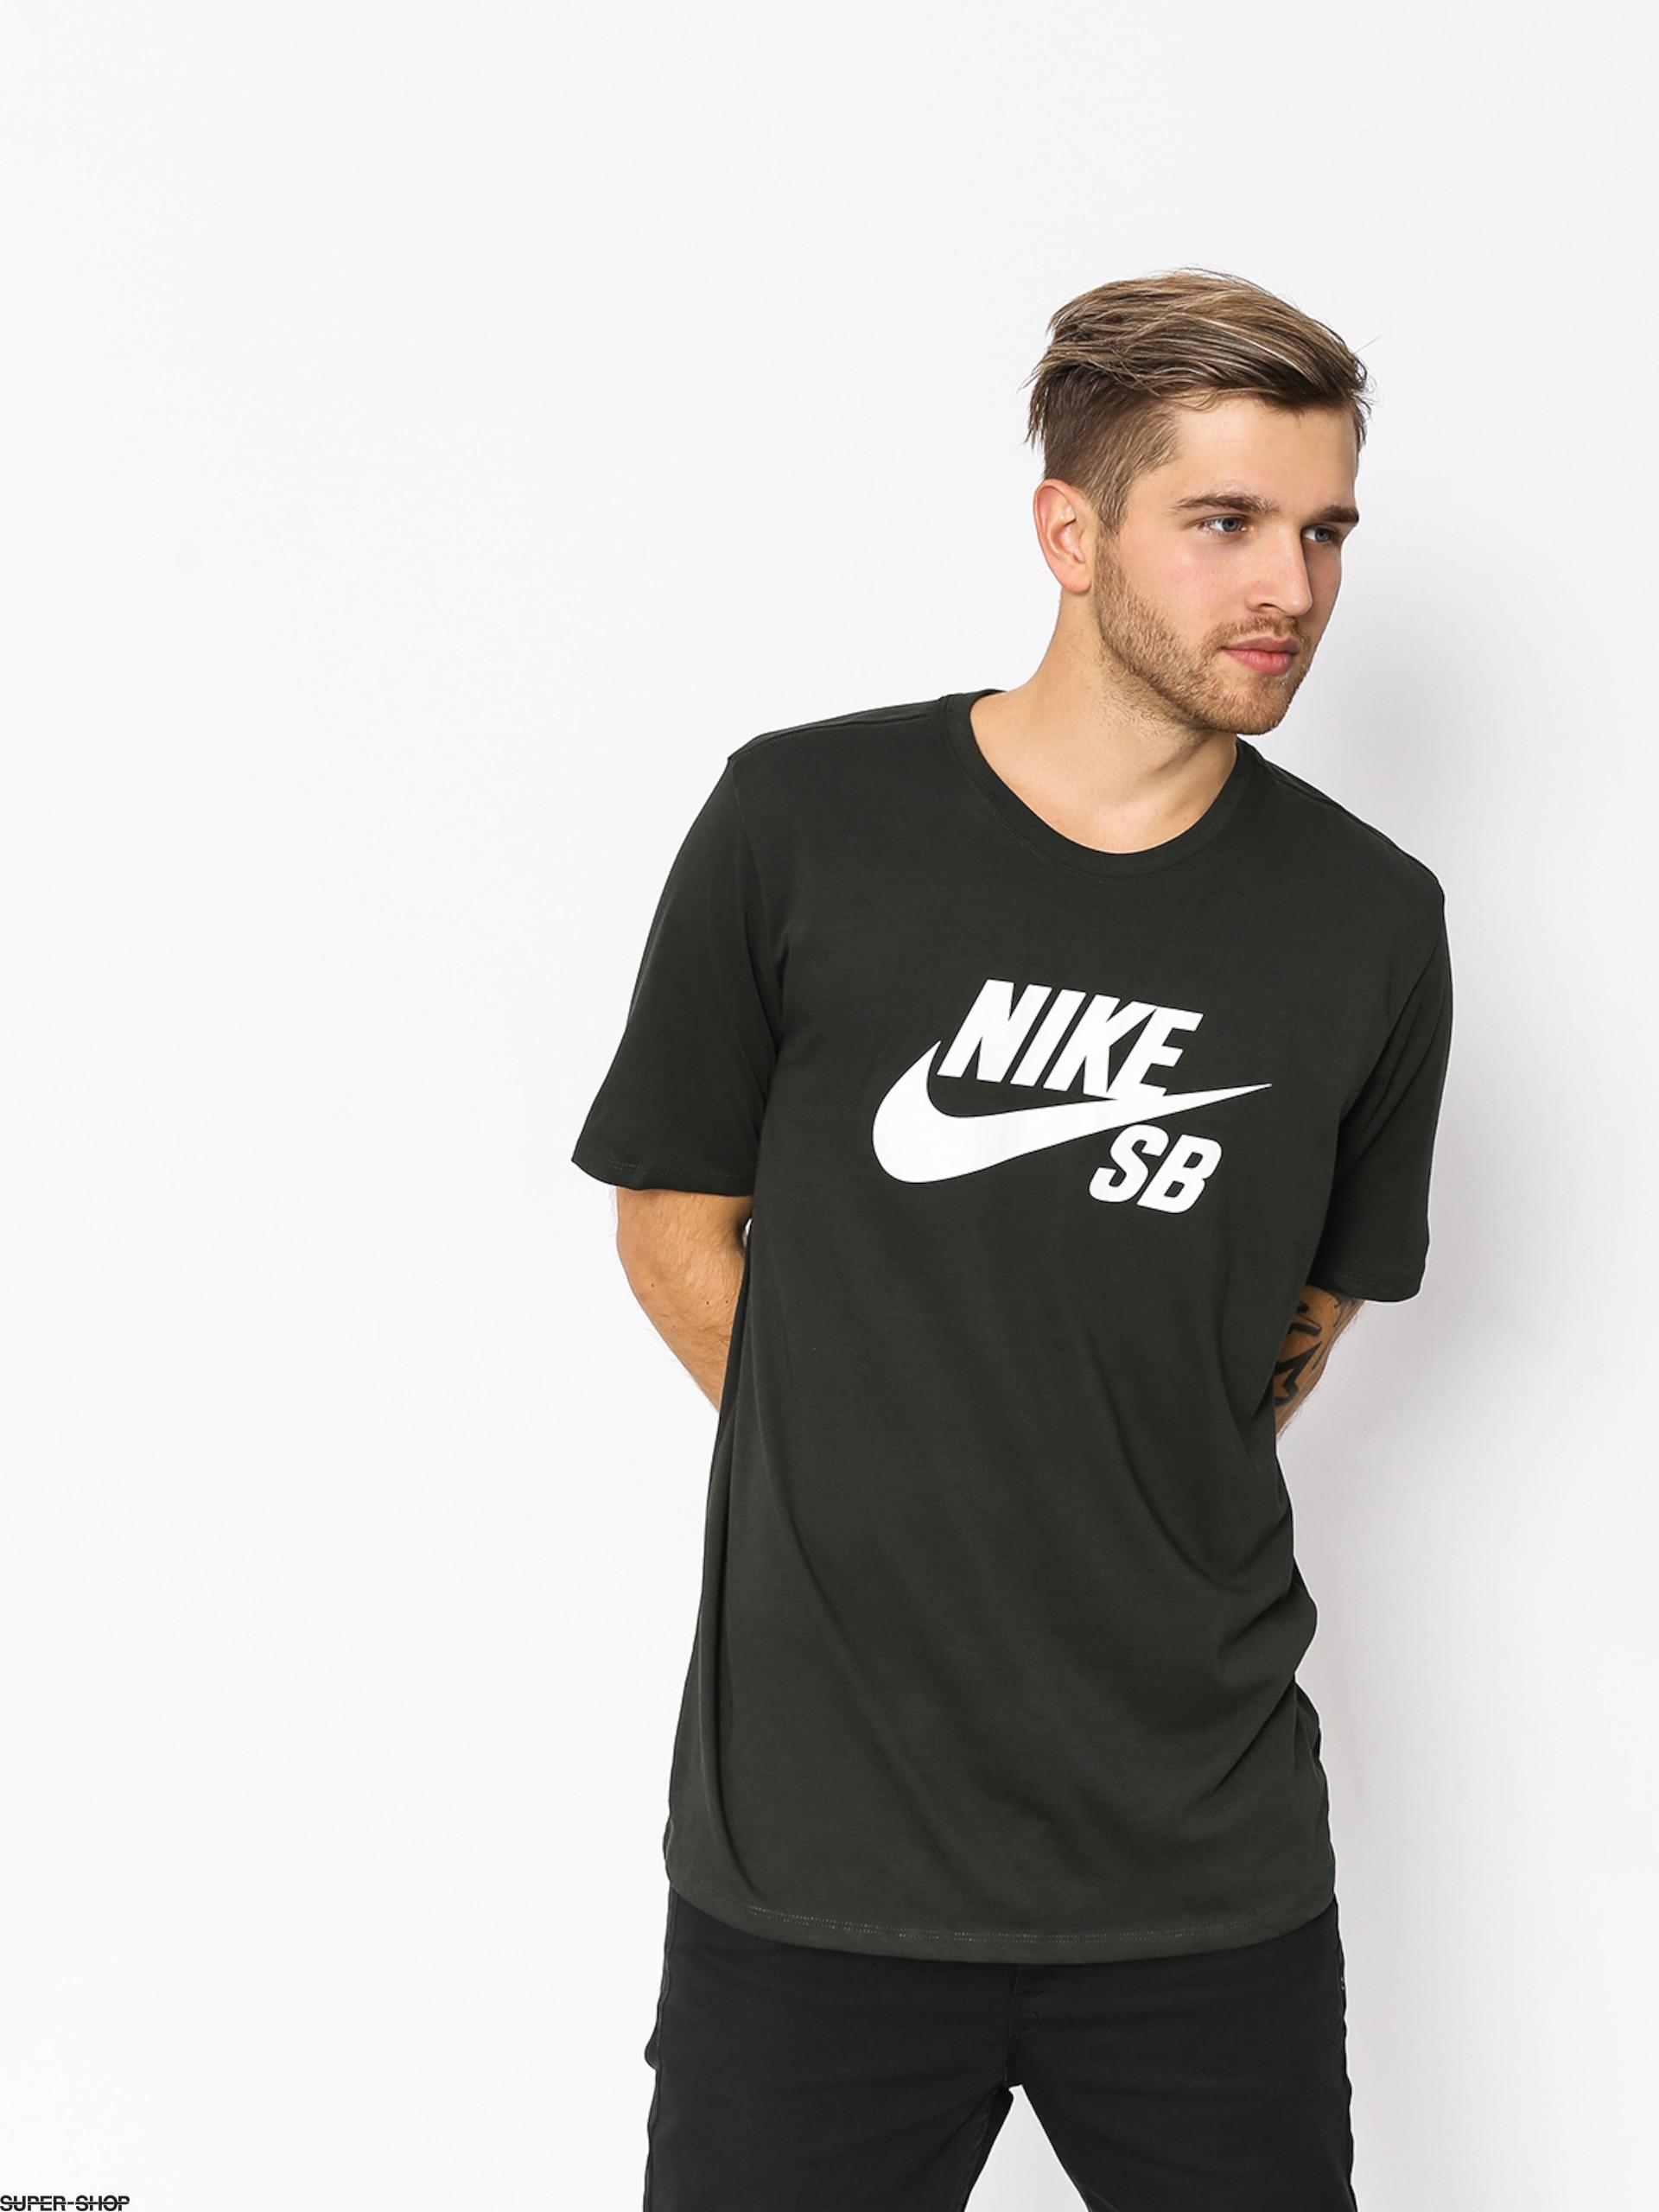 huge discount ec15e 5541b 991708-w1920-nike-sb-sb-logo-tshirt-sequoia-sequoia-white.jpg